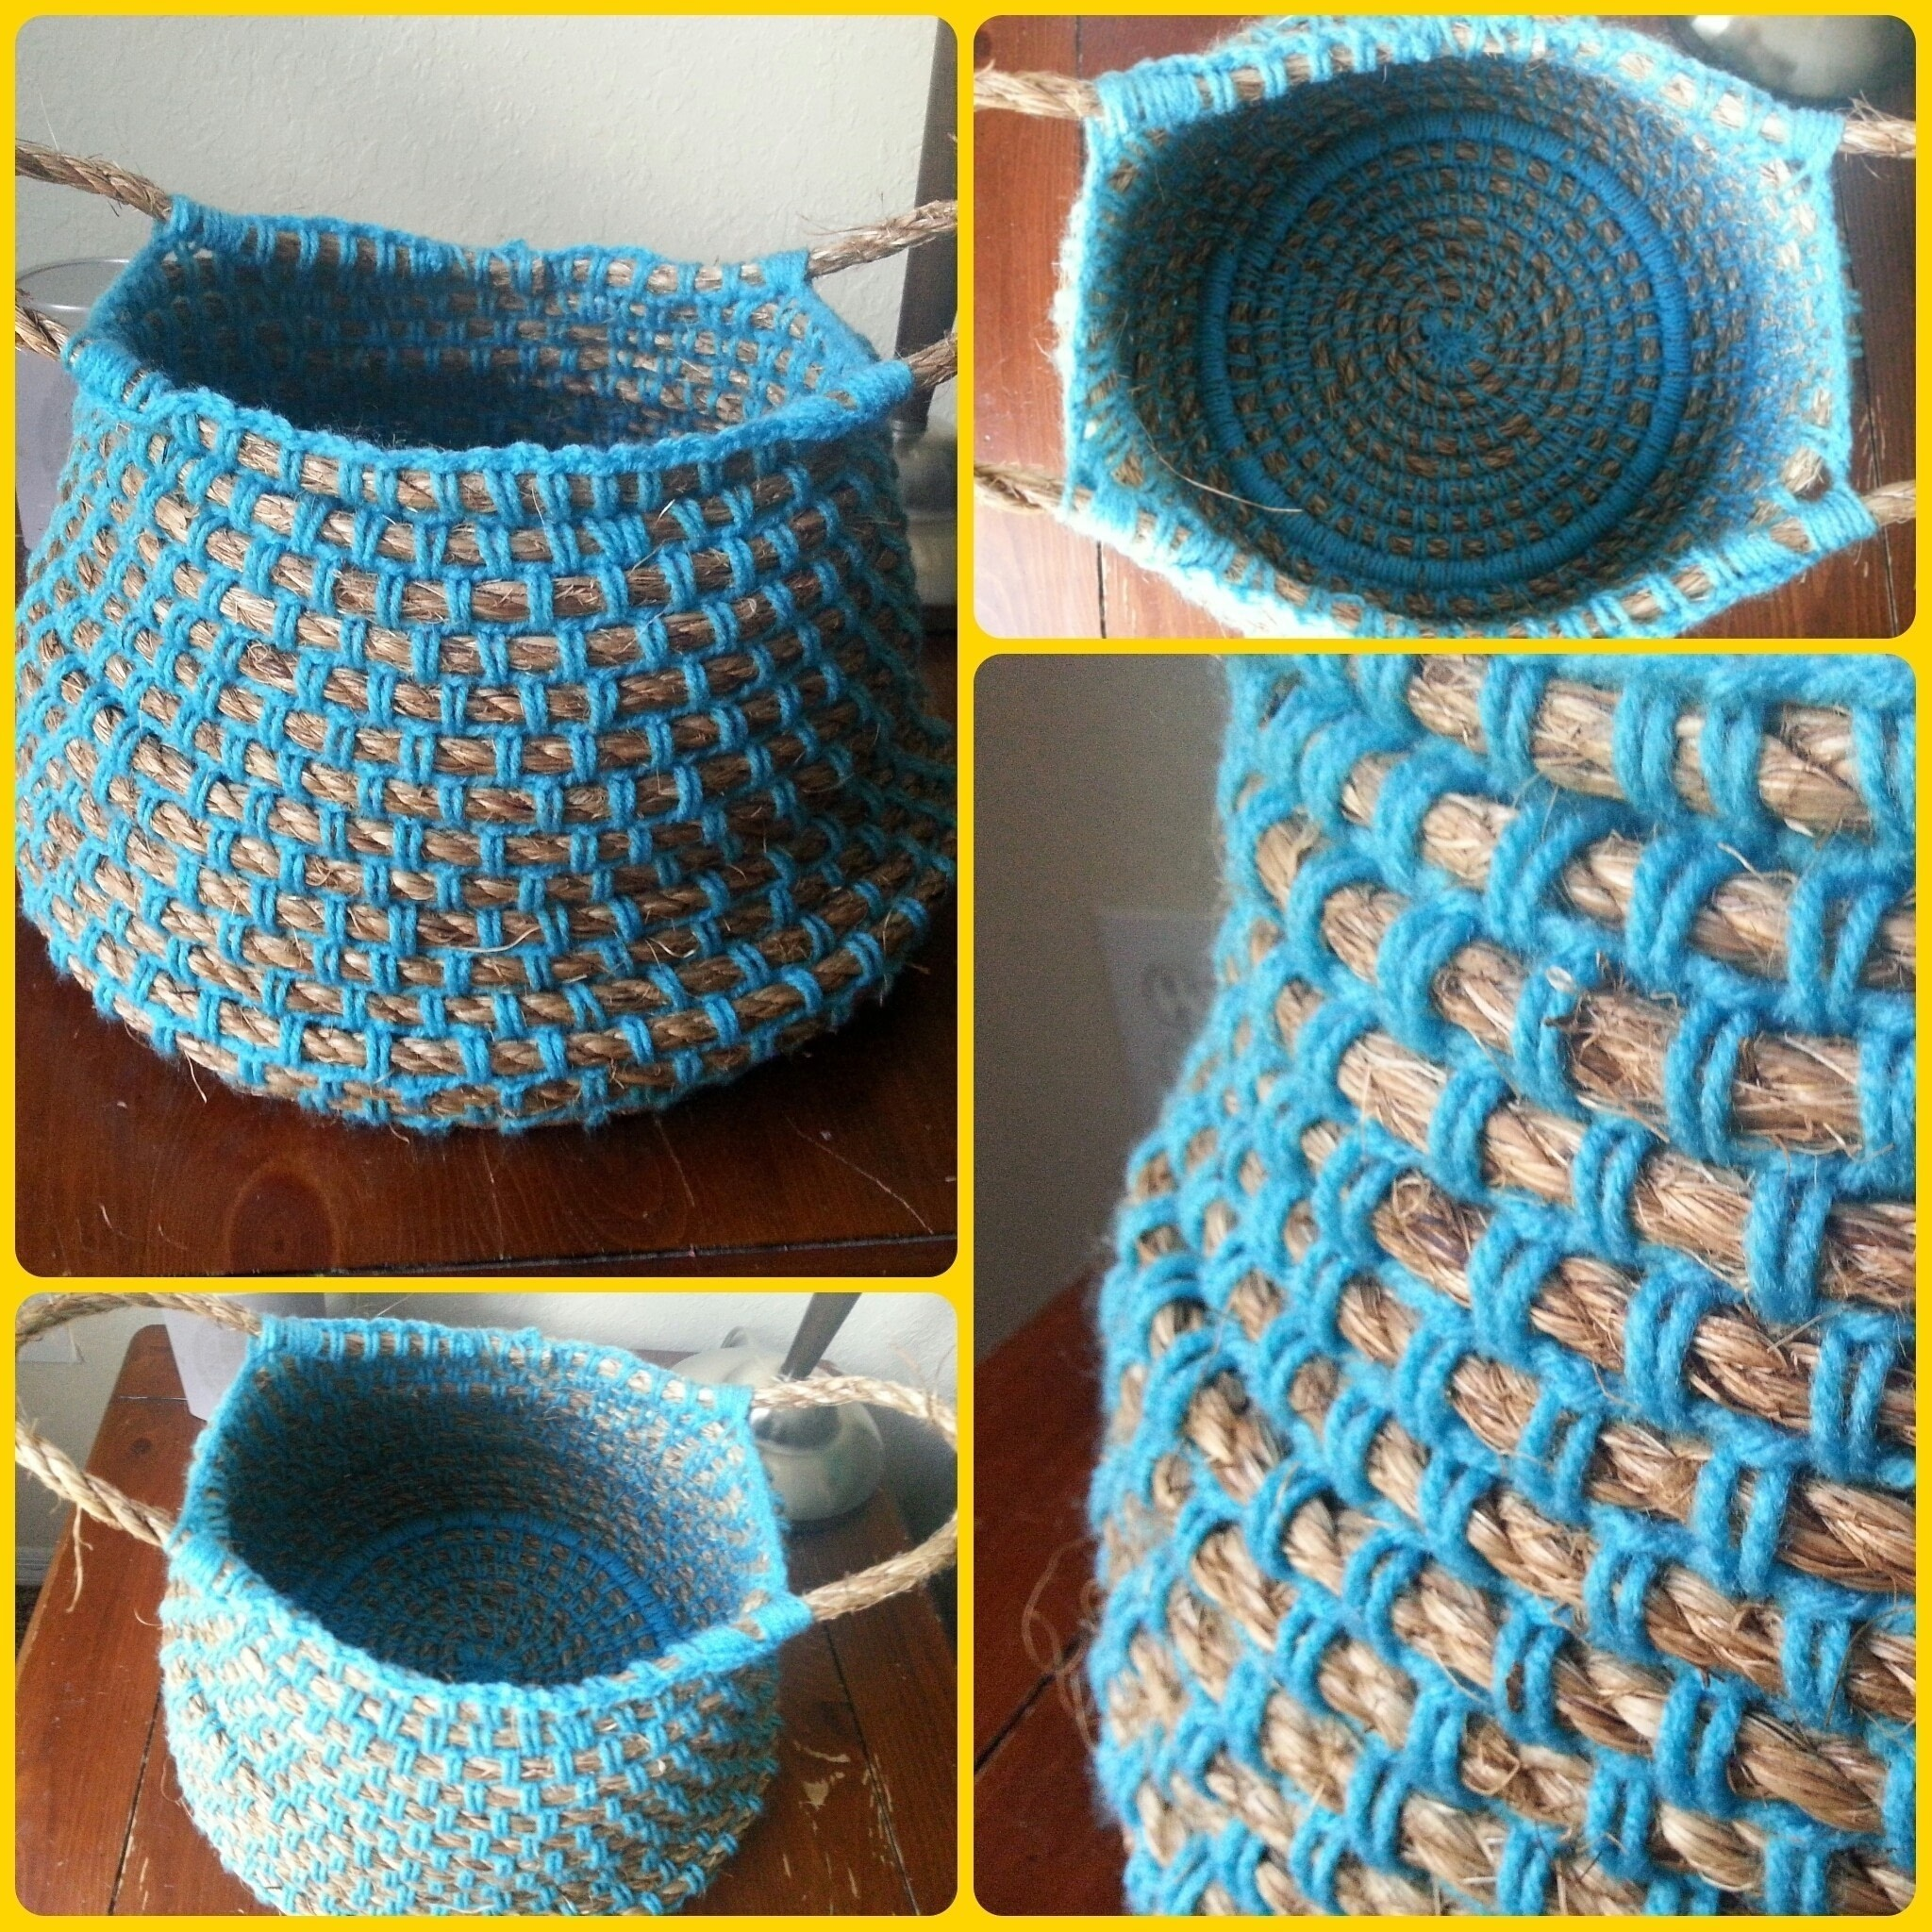 Crochet Rope Basket 183 A Knit Or Crochet Basket 183 Home